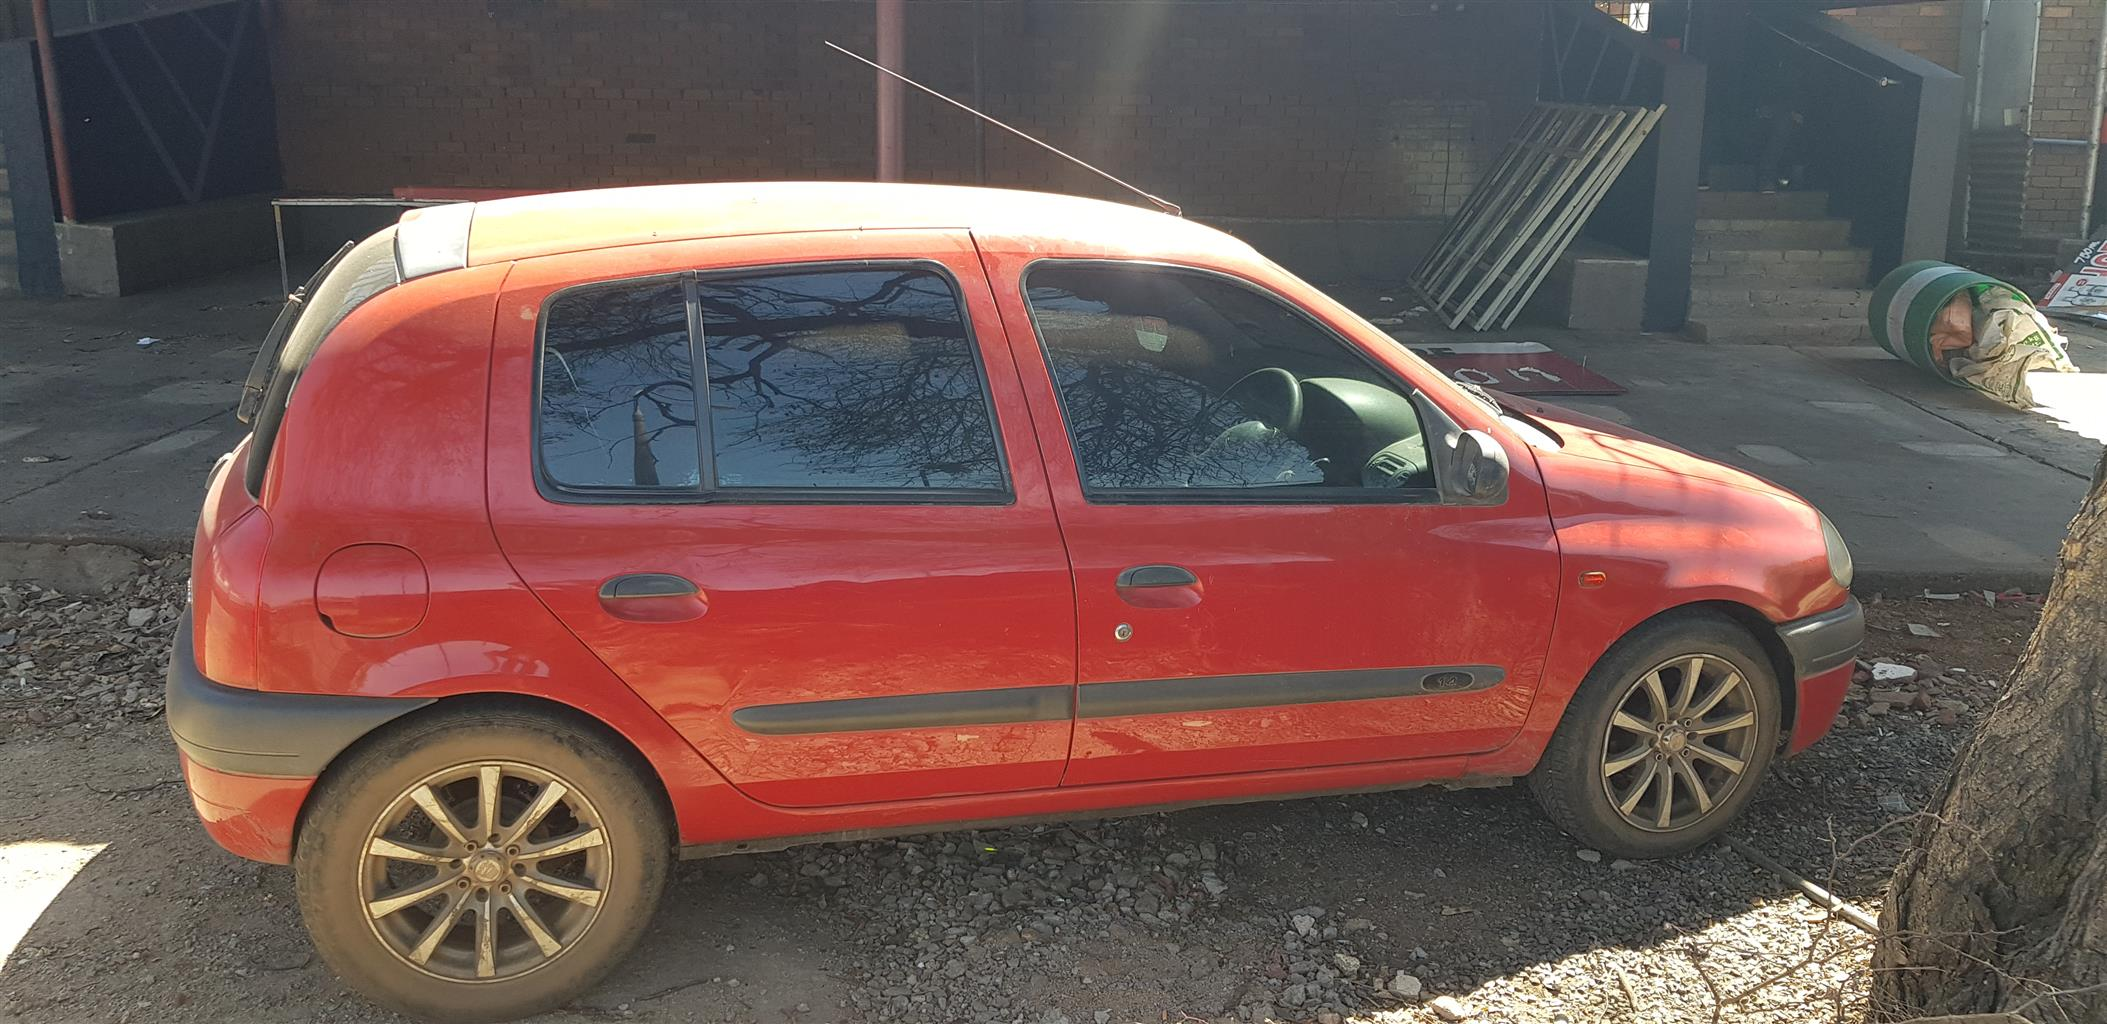 2003 Renault Clio 1.4 Expression 5 door